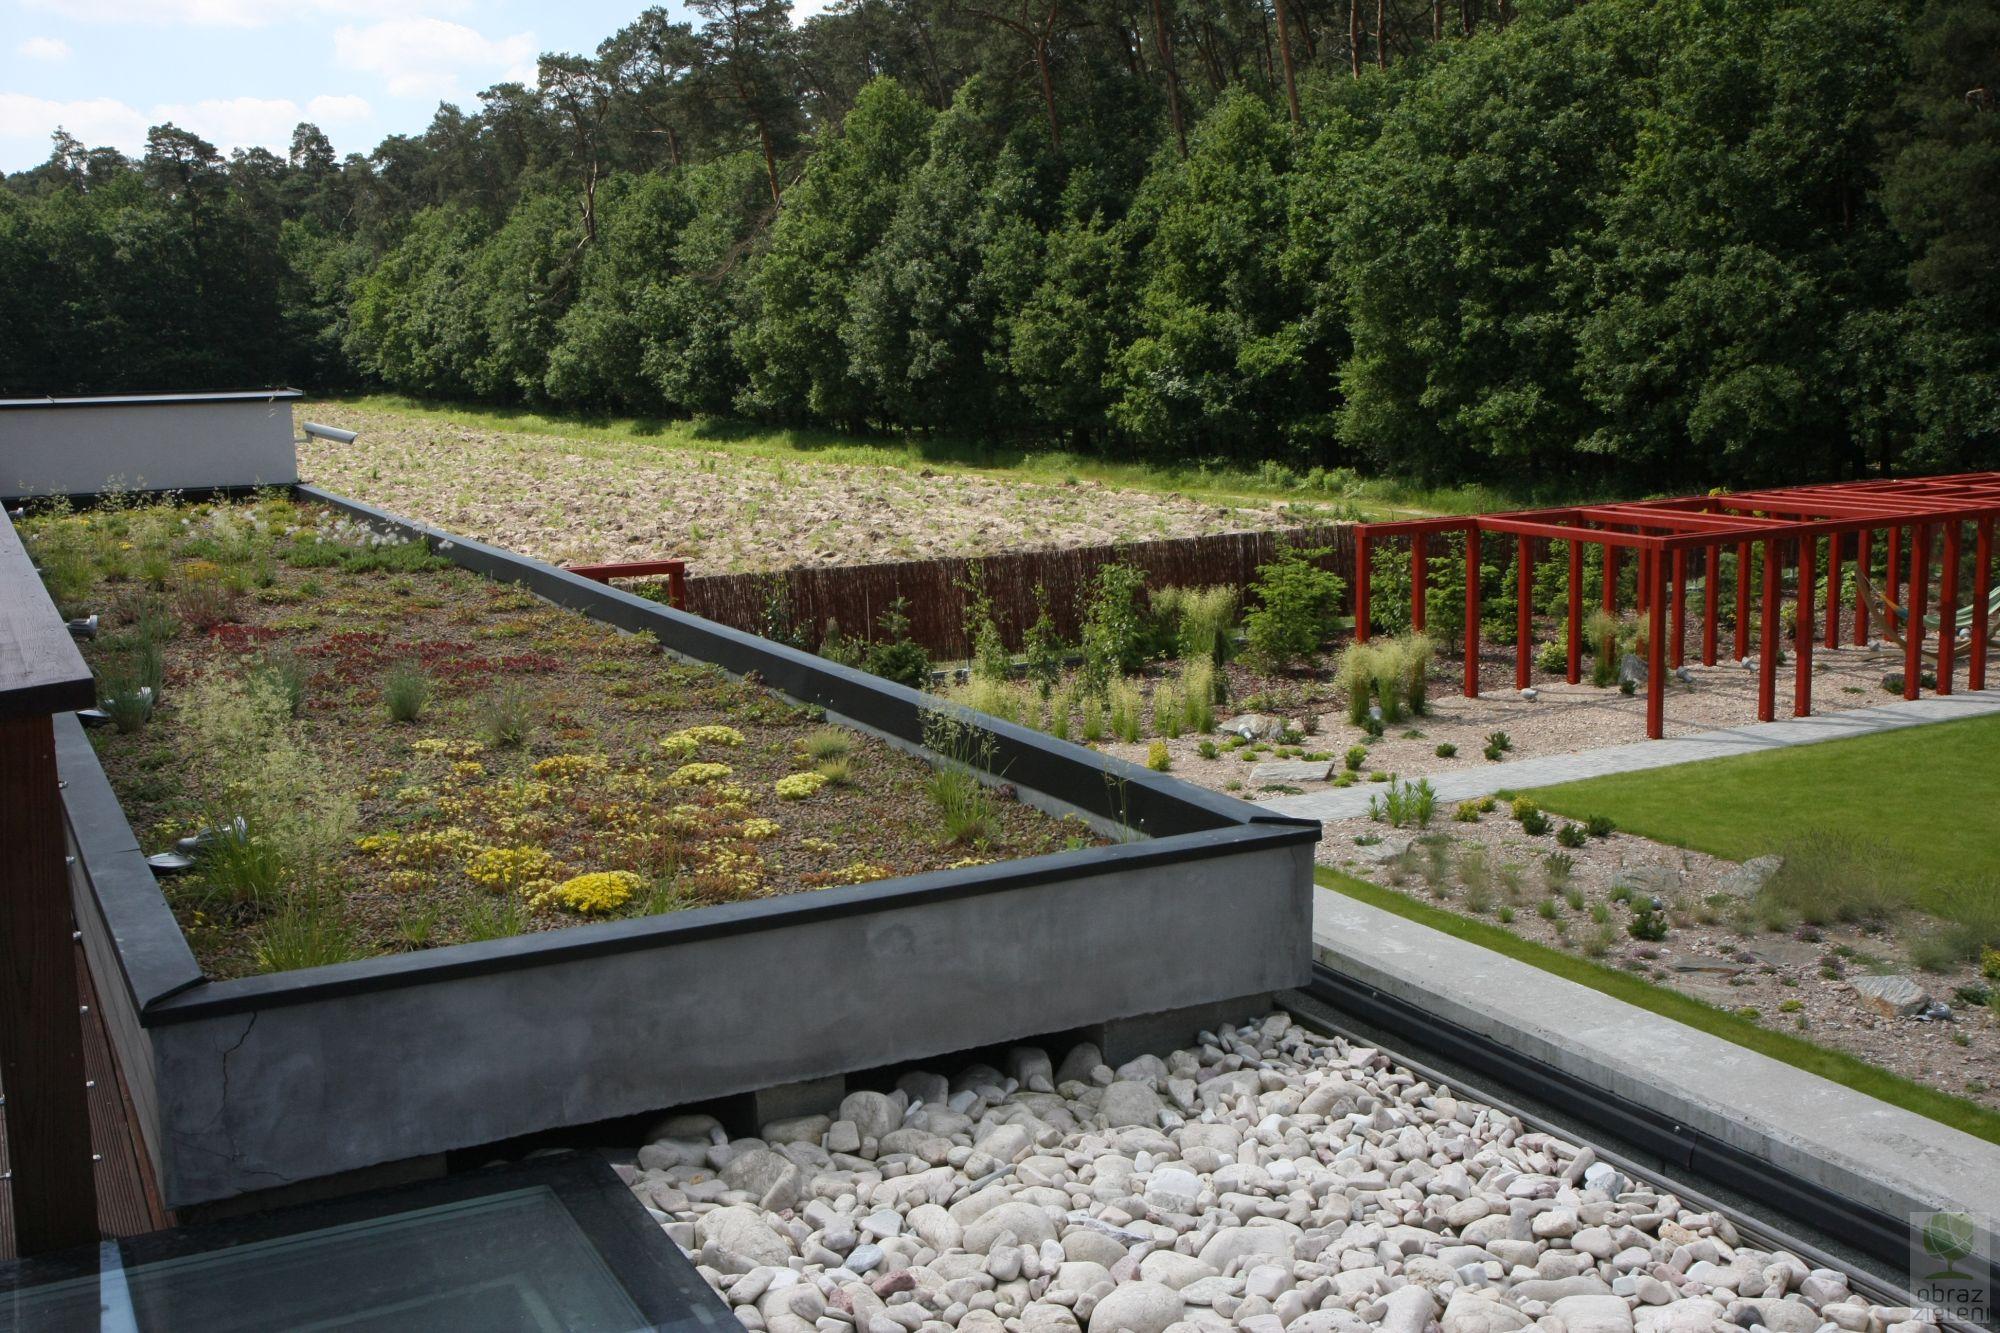 Ogród nowoczesny z ogrodem na dachu. 2014